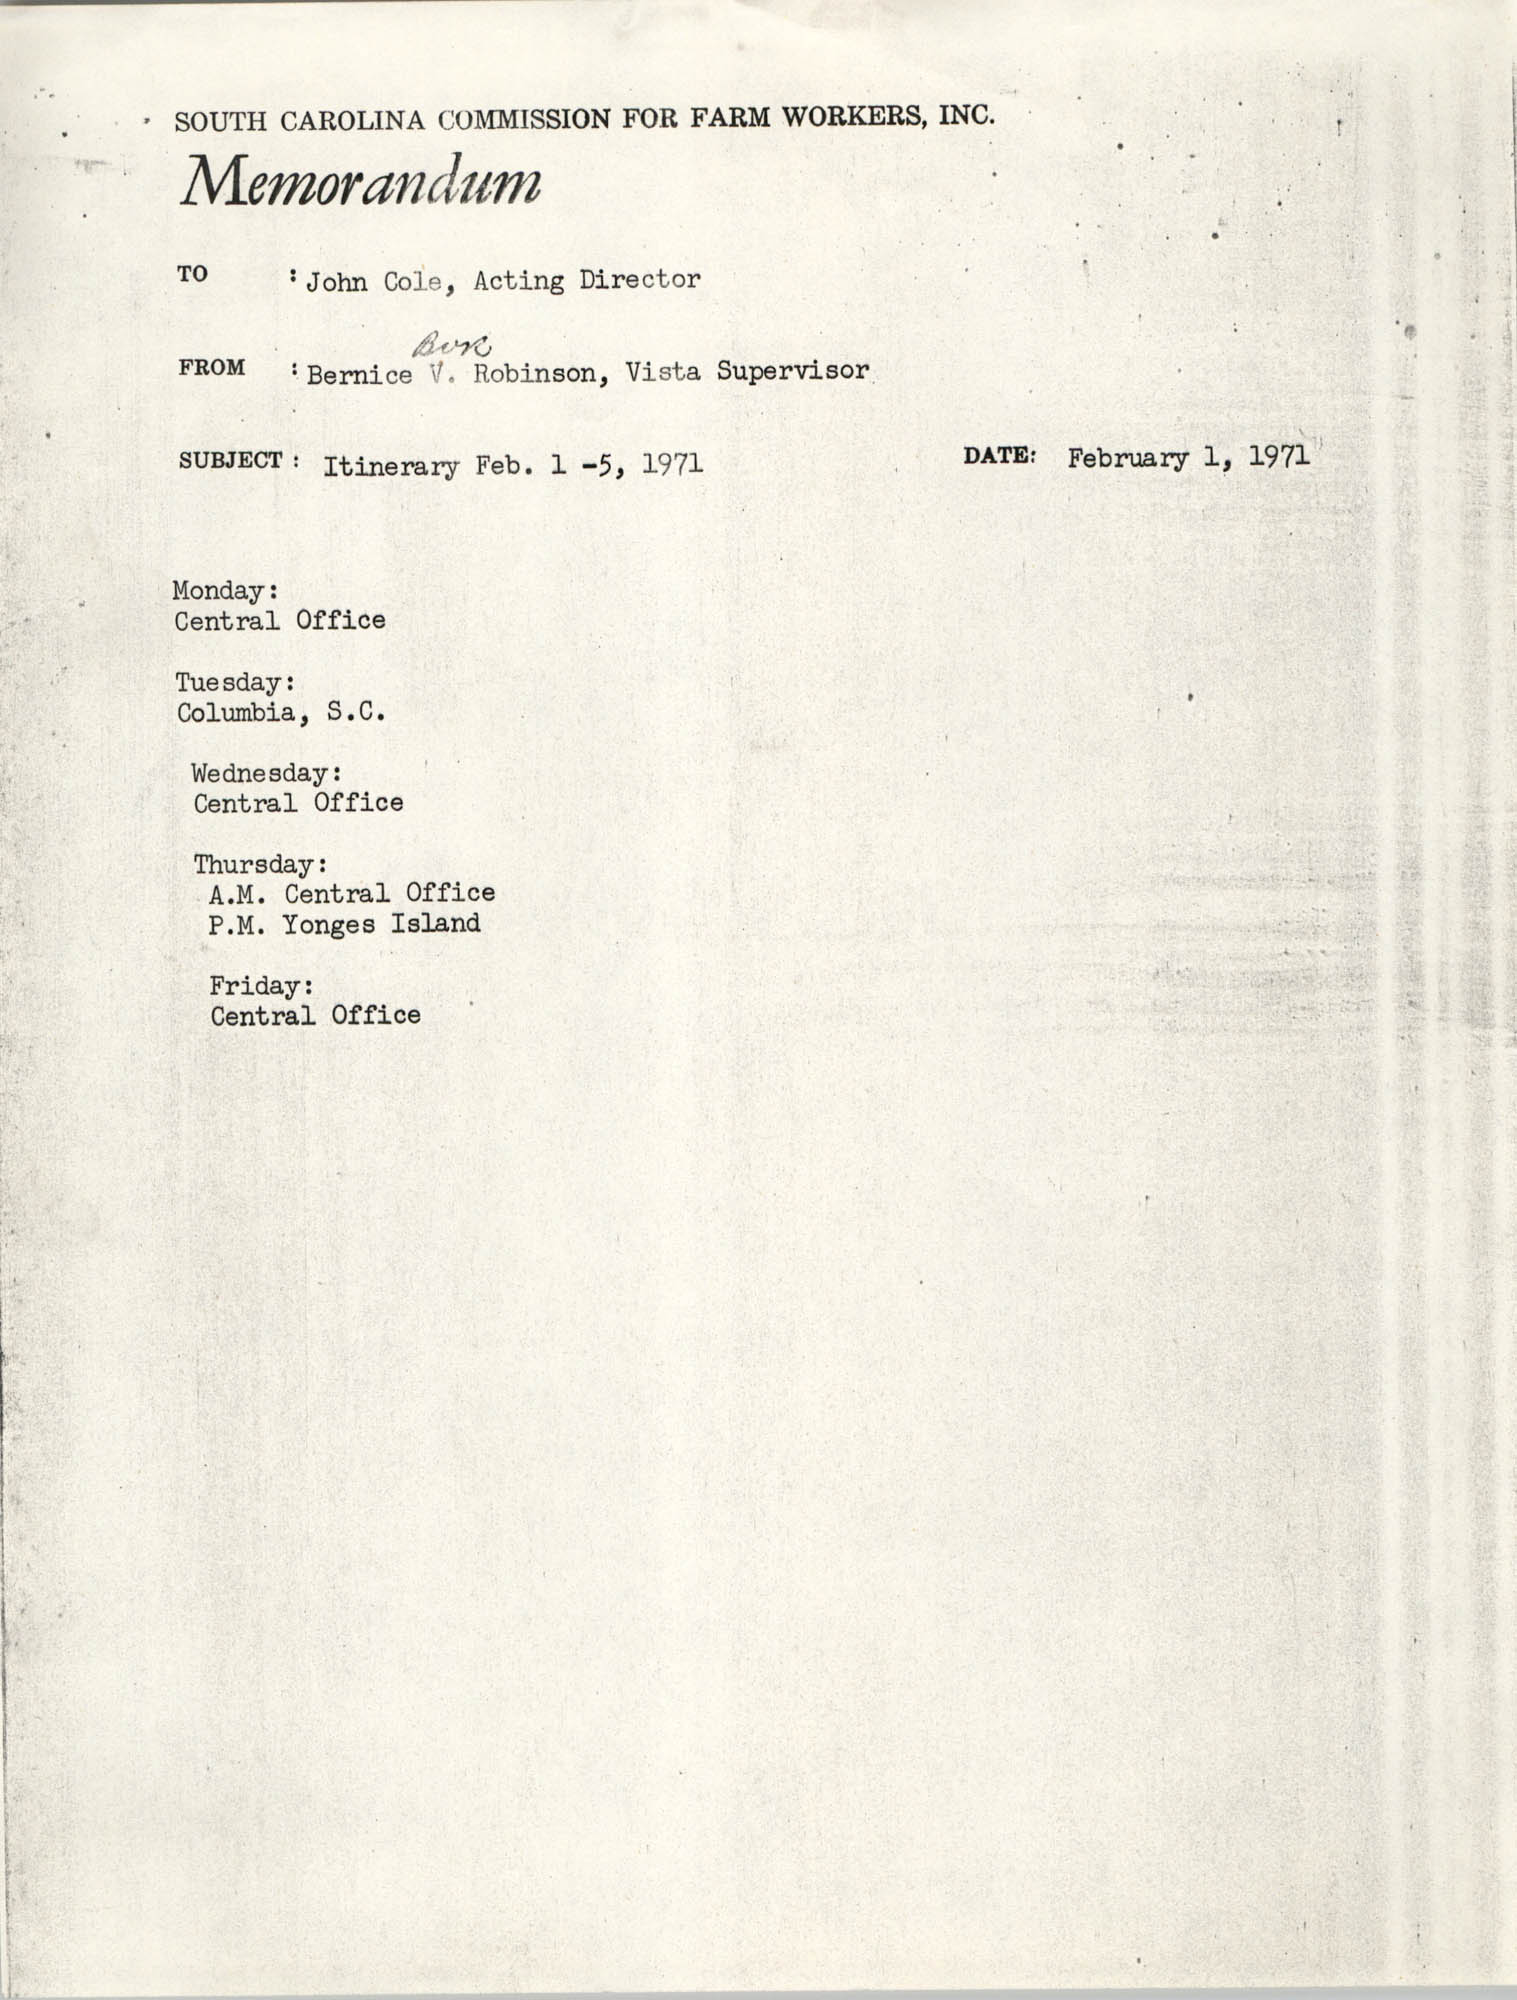 Memorandum from Bernice V. Robinson to John Cole, February 1, 1971